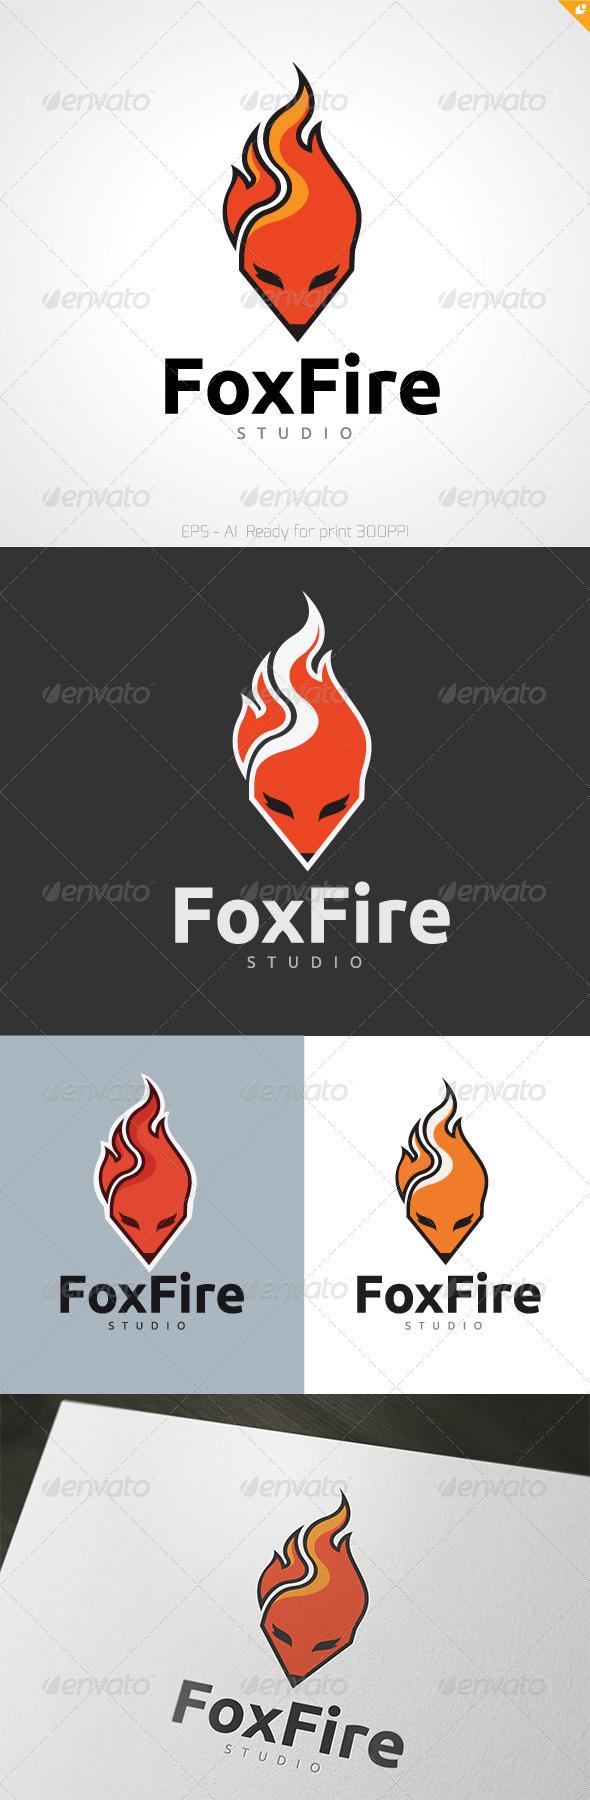 Foxfire Logo - Animals Logo Templates